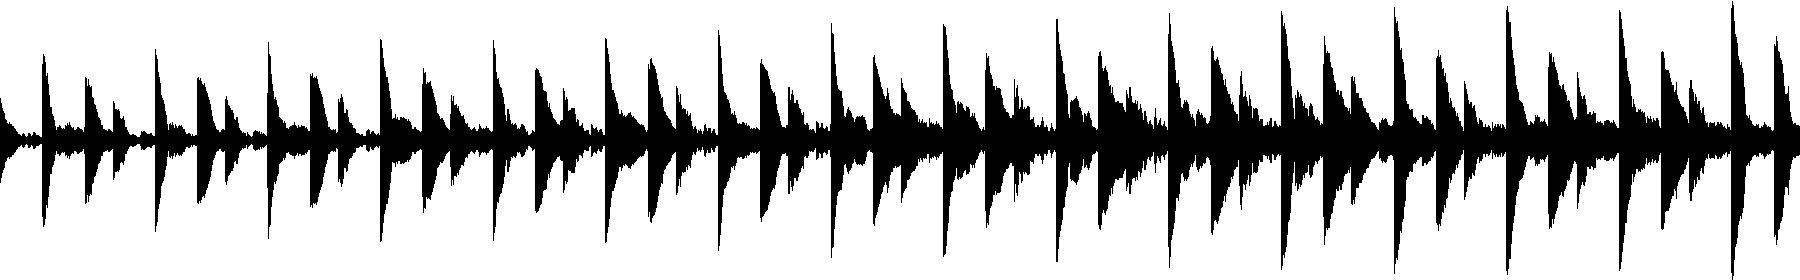 vedh melodyloop 109 fm9 em9 124bpm